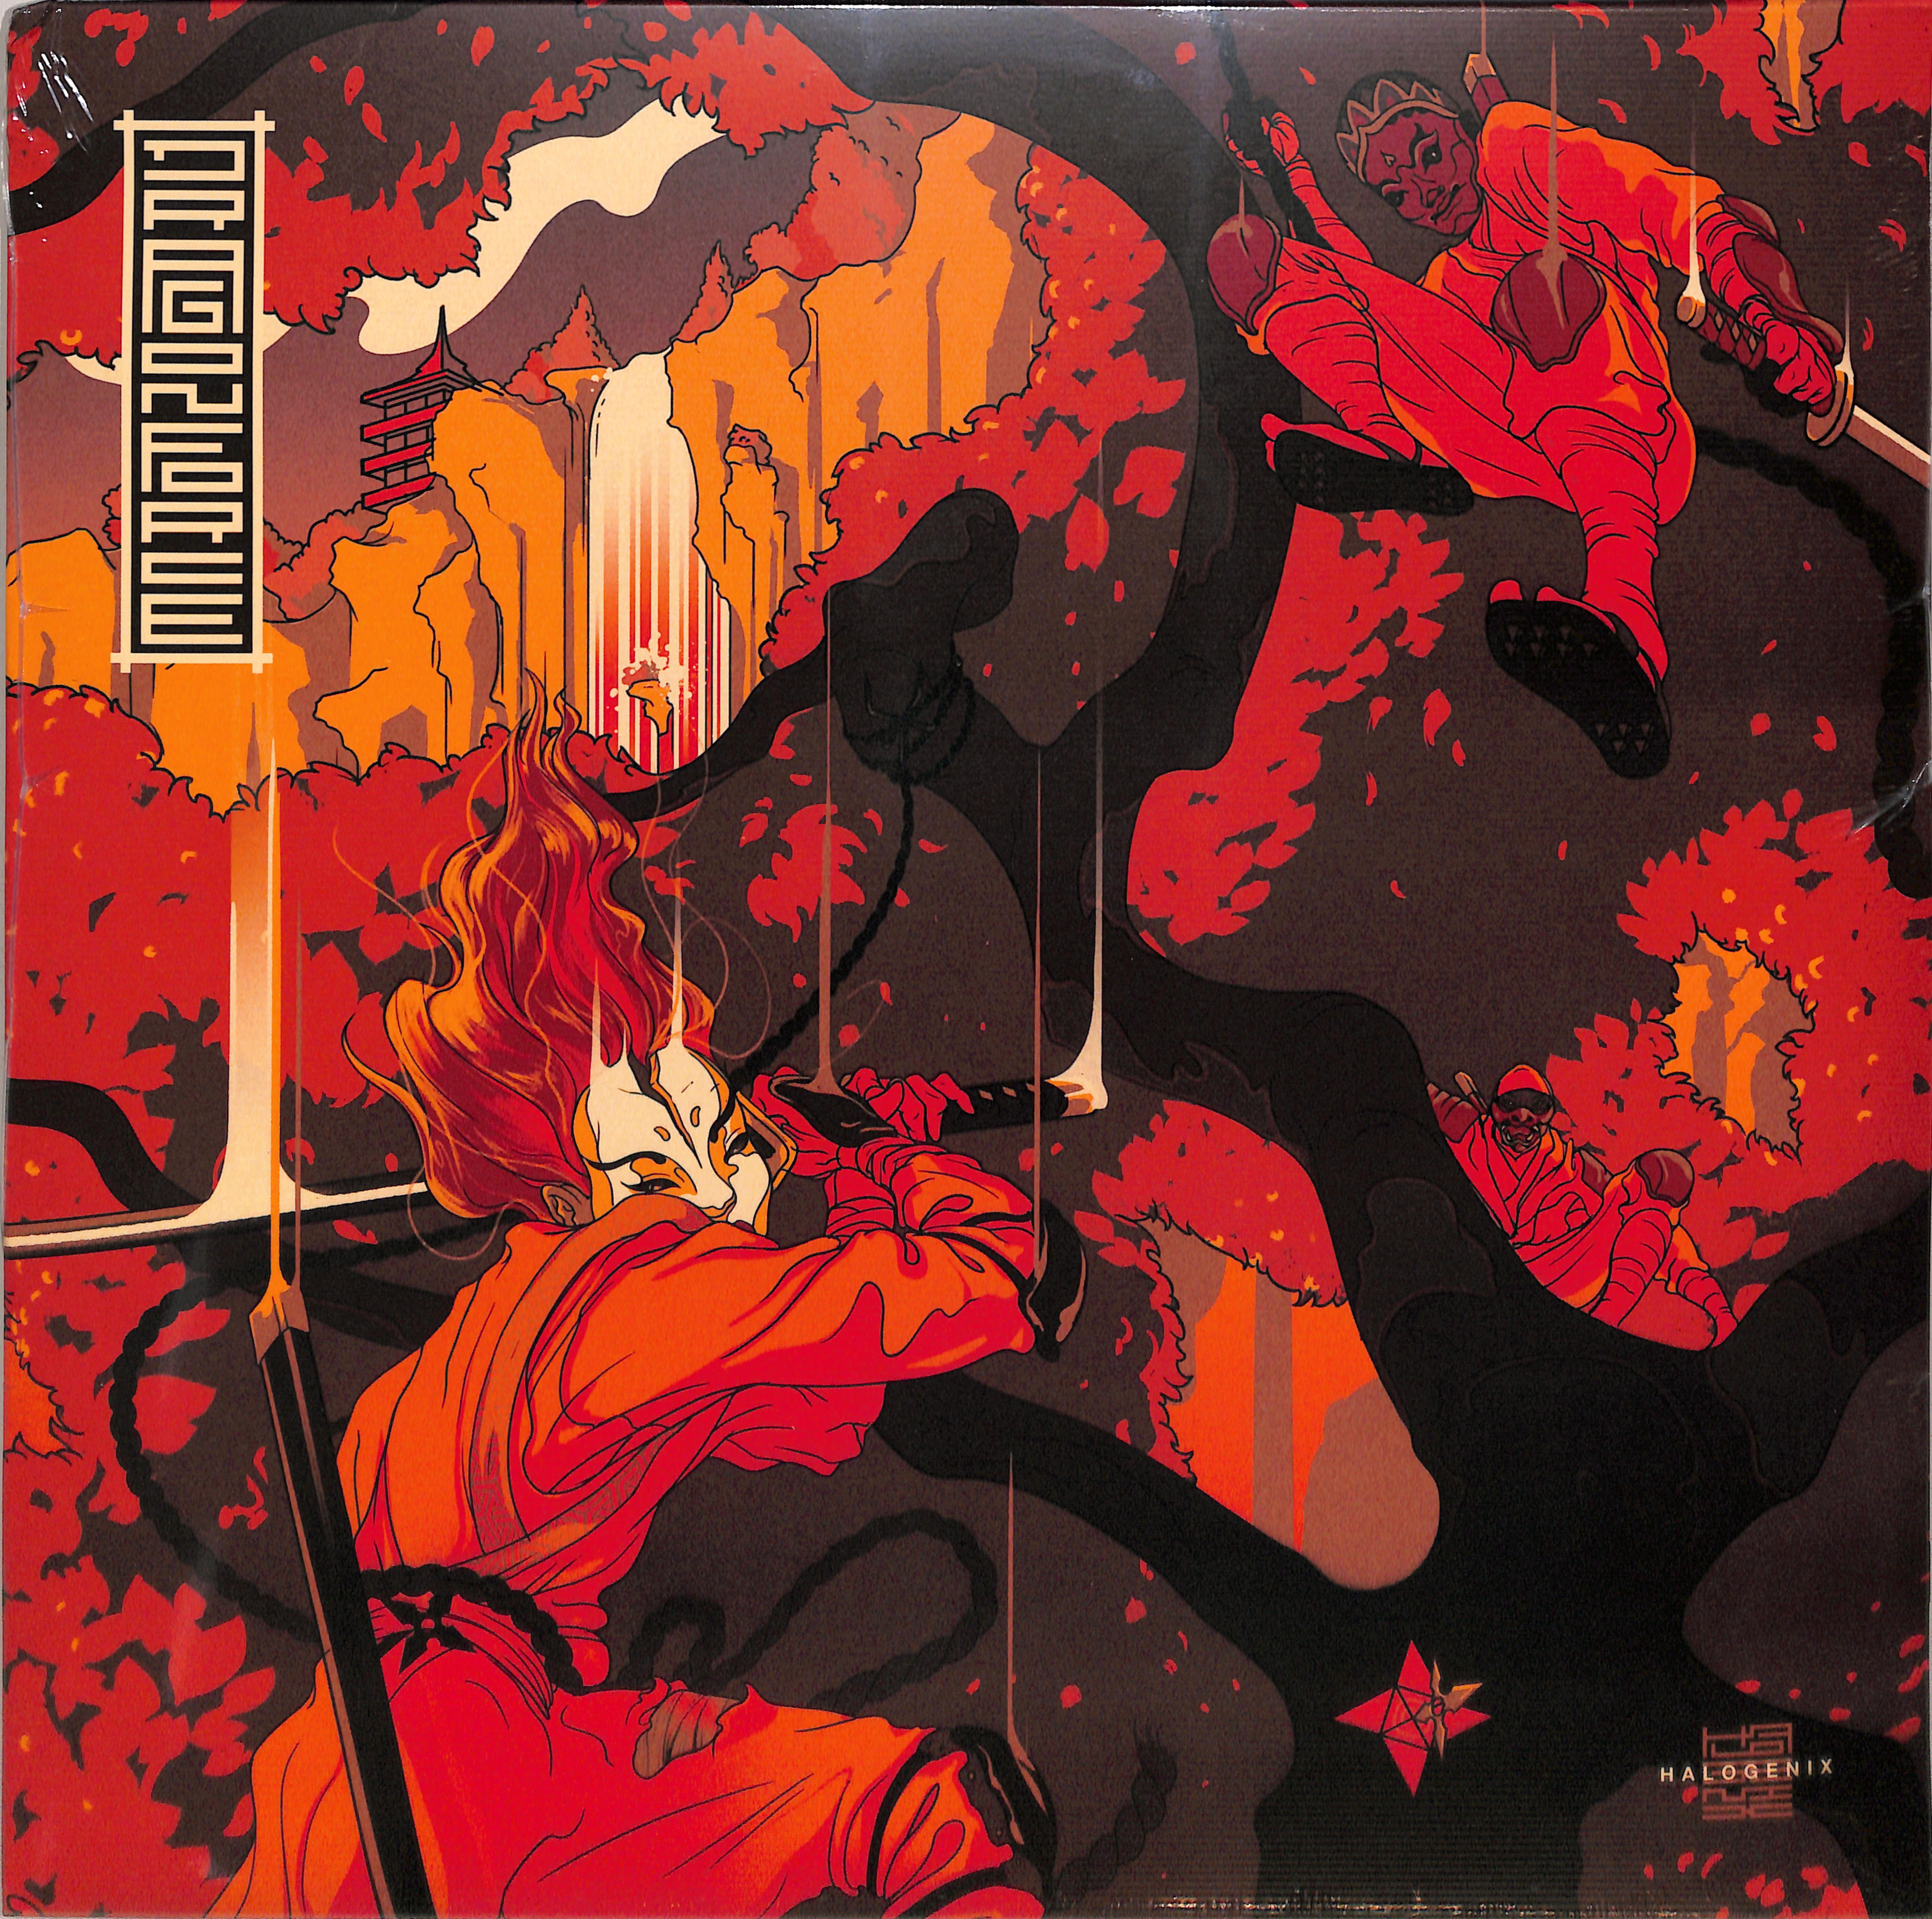 Halogenix - DRAGON FORCE EP